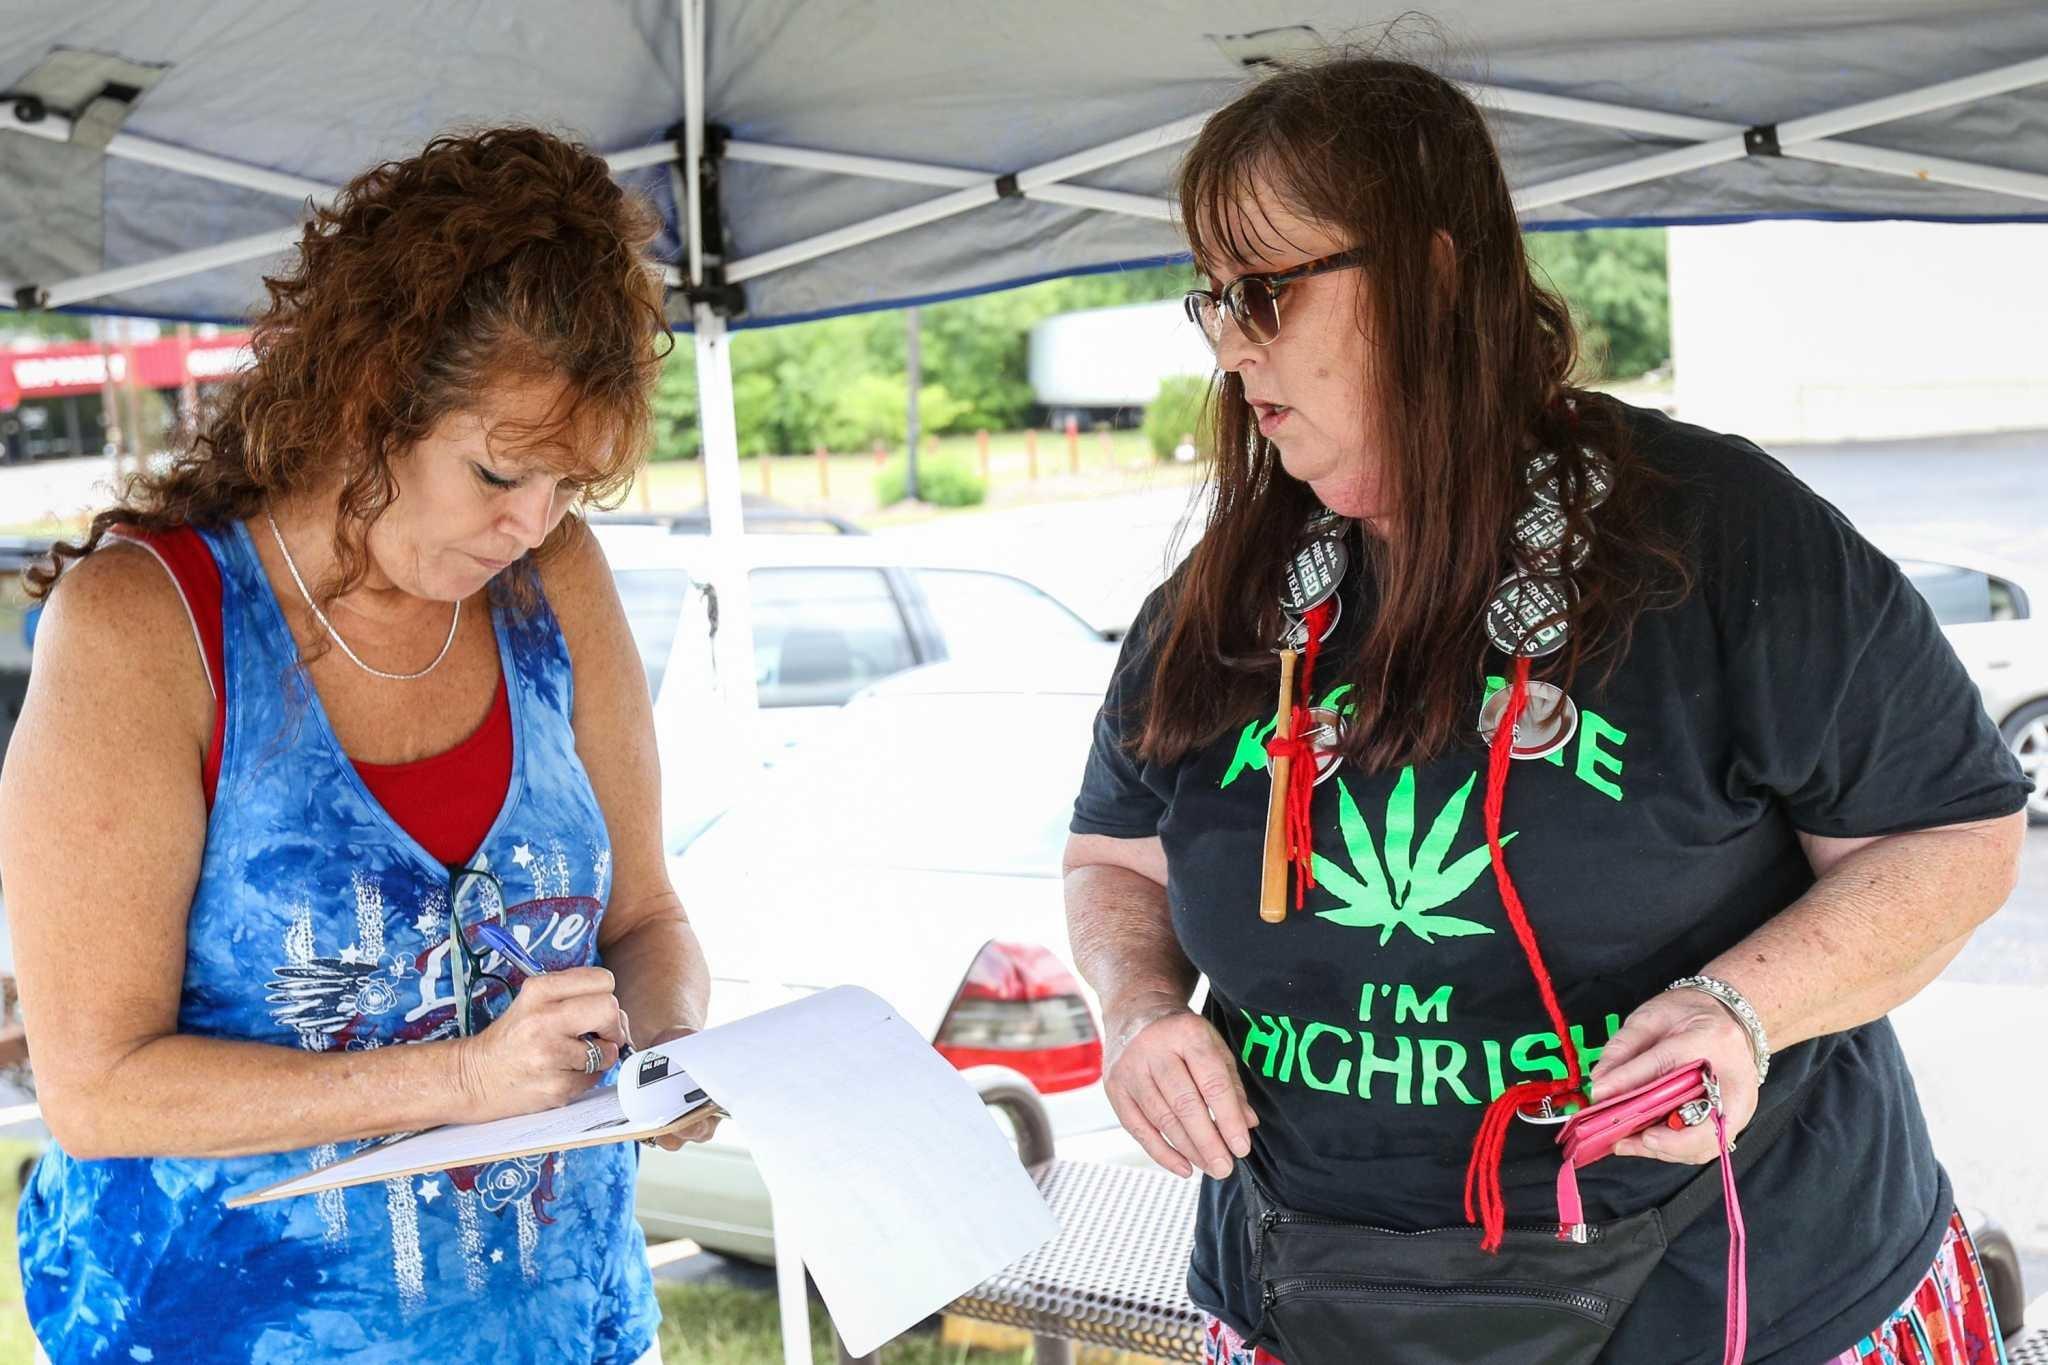 Police groups decry Texas push for marijuana decriminalization